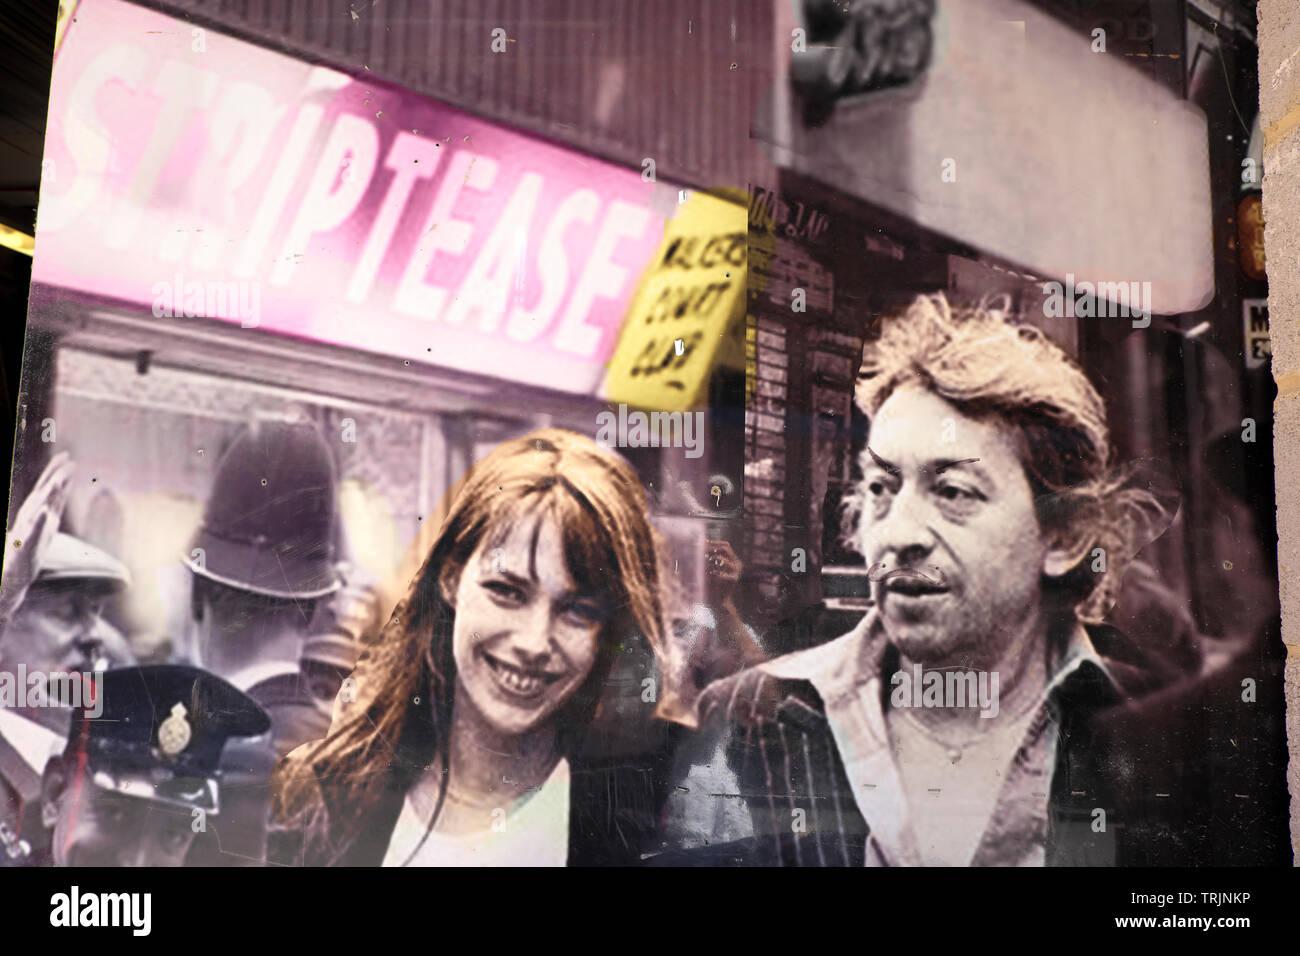 Serge Gainsbourg & Jane Birkin 1970s vintage poster collage on wall of derelict building site being demolished Soho London England UK  KATHY DEWITT - Stock Image